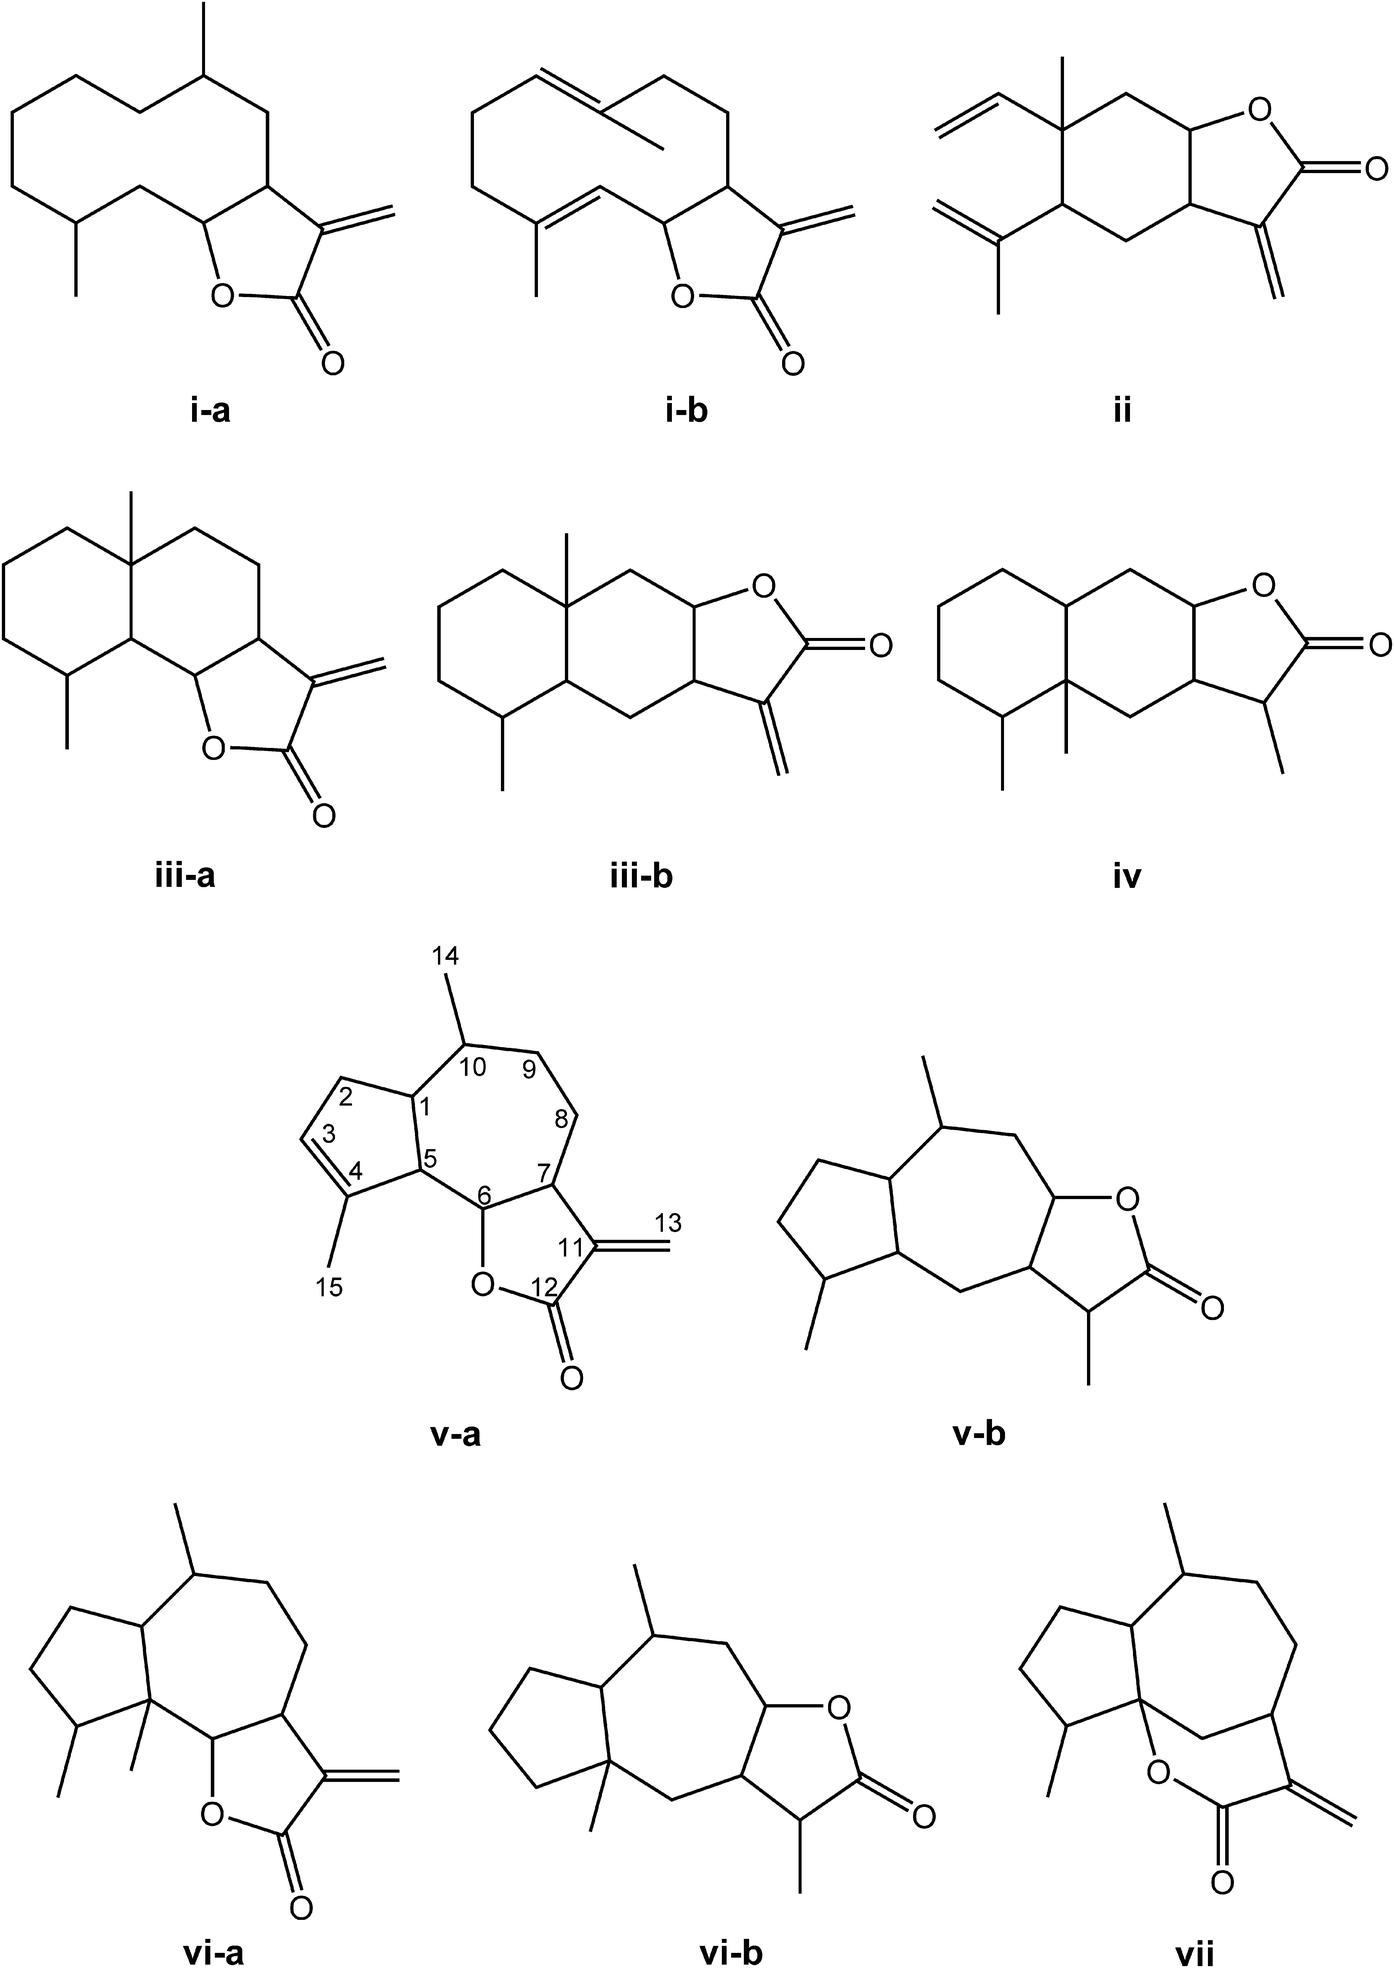 Biosynthesis and bioactivity of Cynara cardunculus L